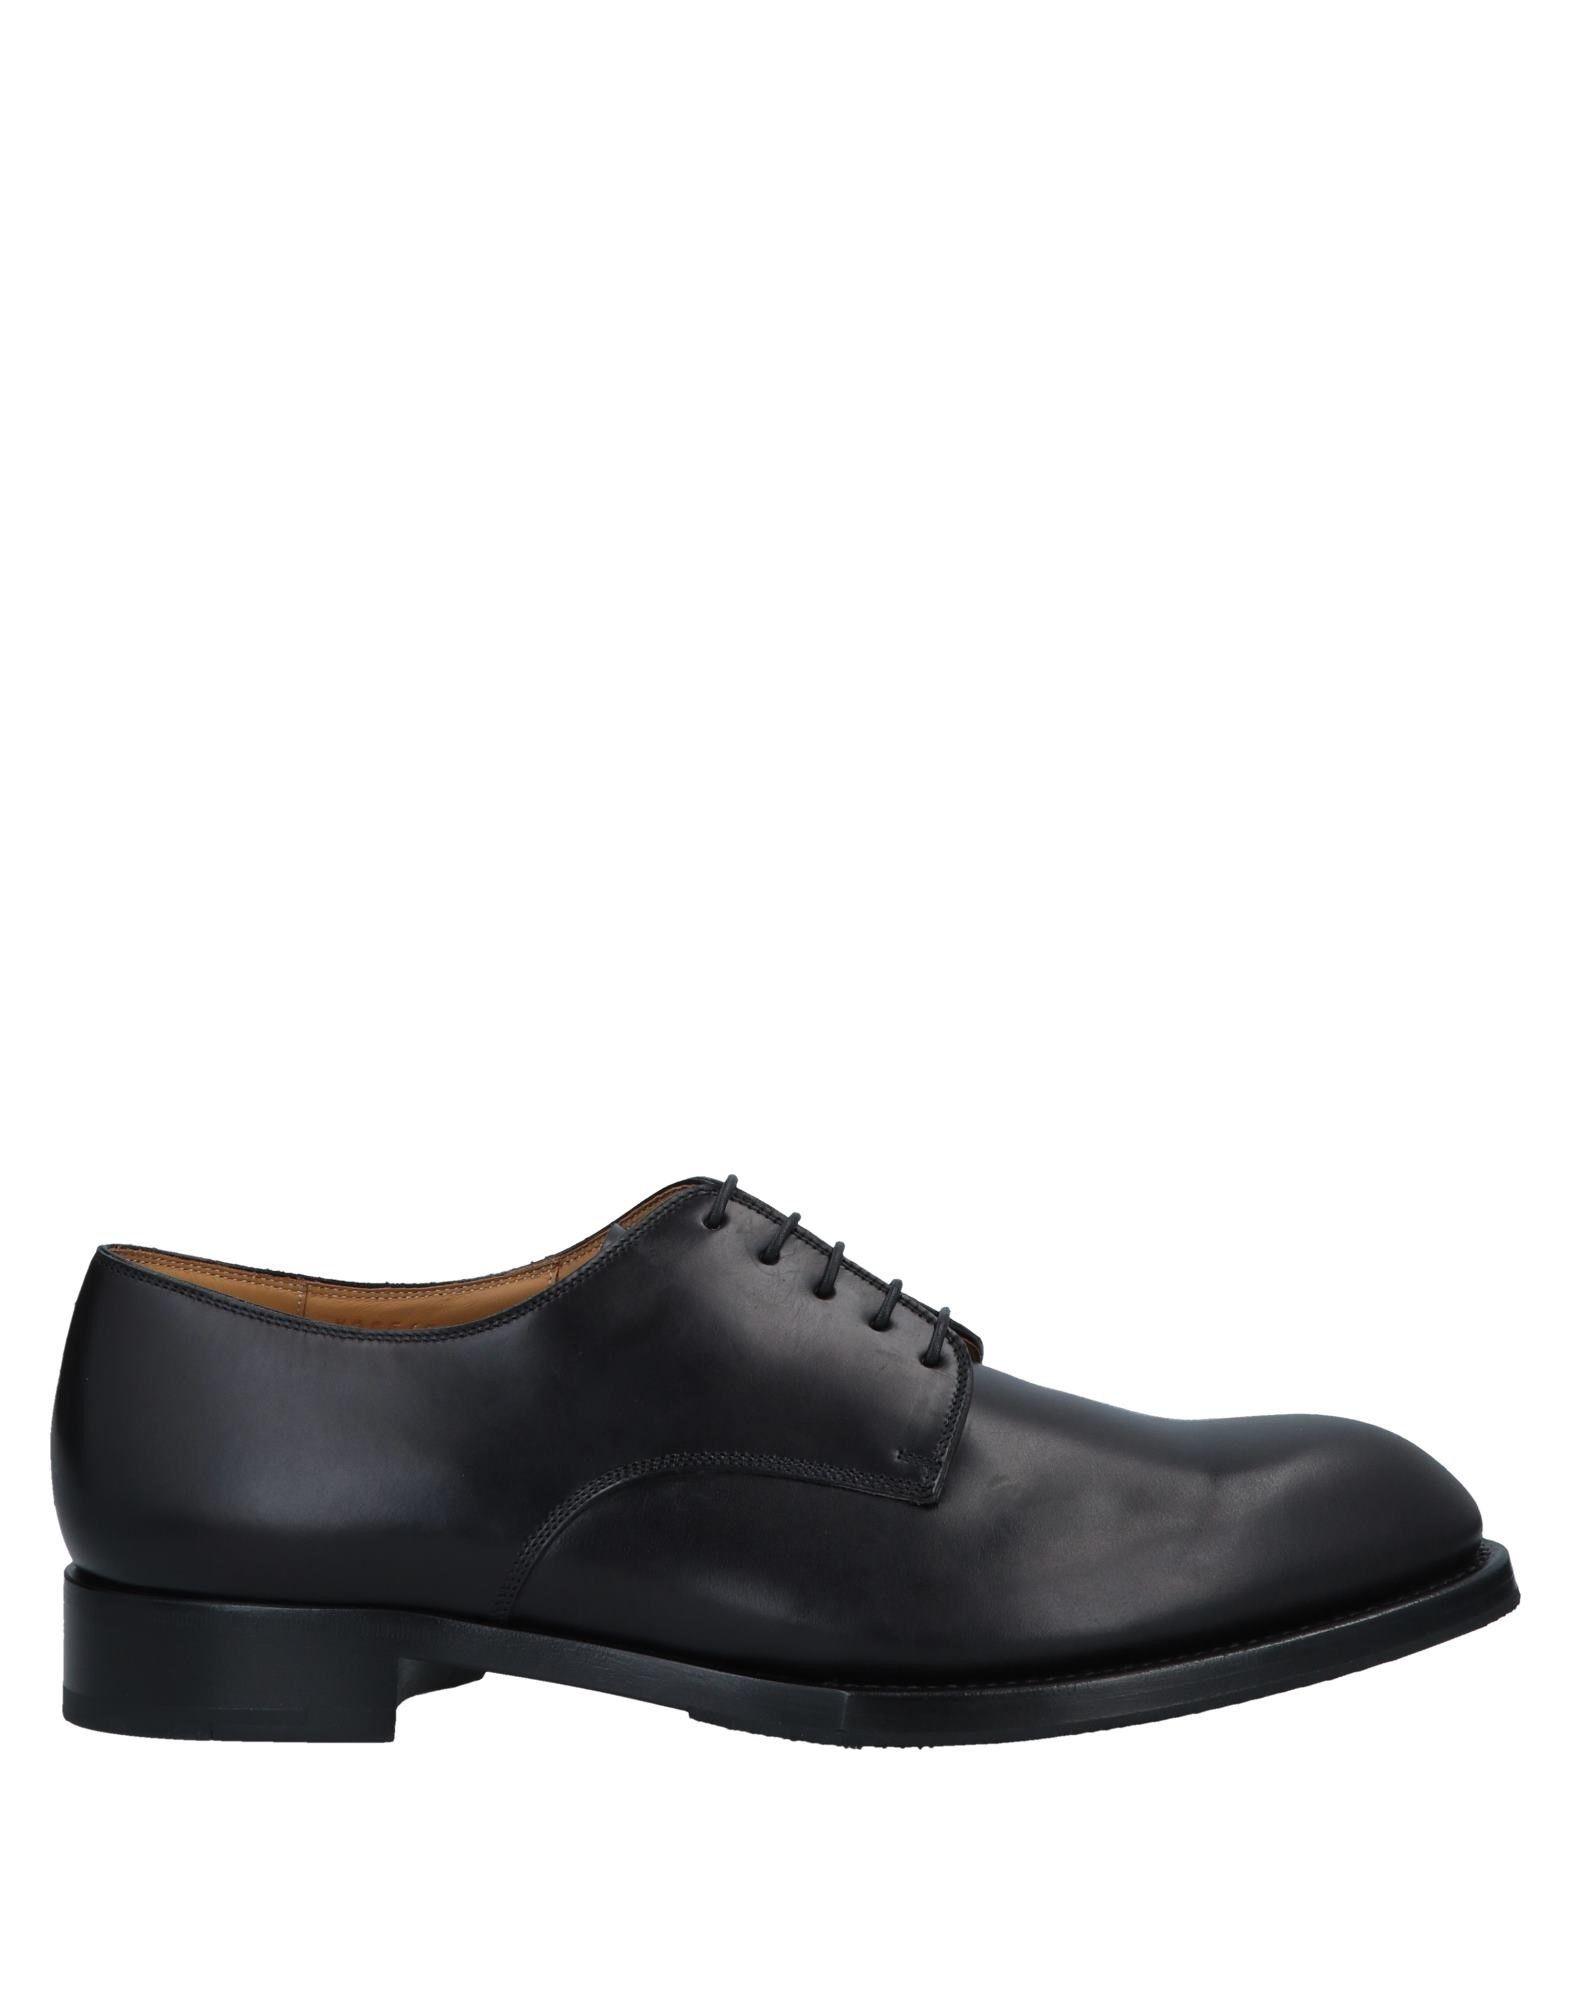 GIORGIO ARMANI Обувь на шнурках giorgio armani обувь на шнурках